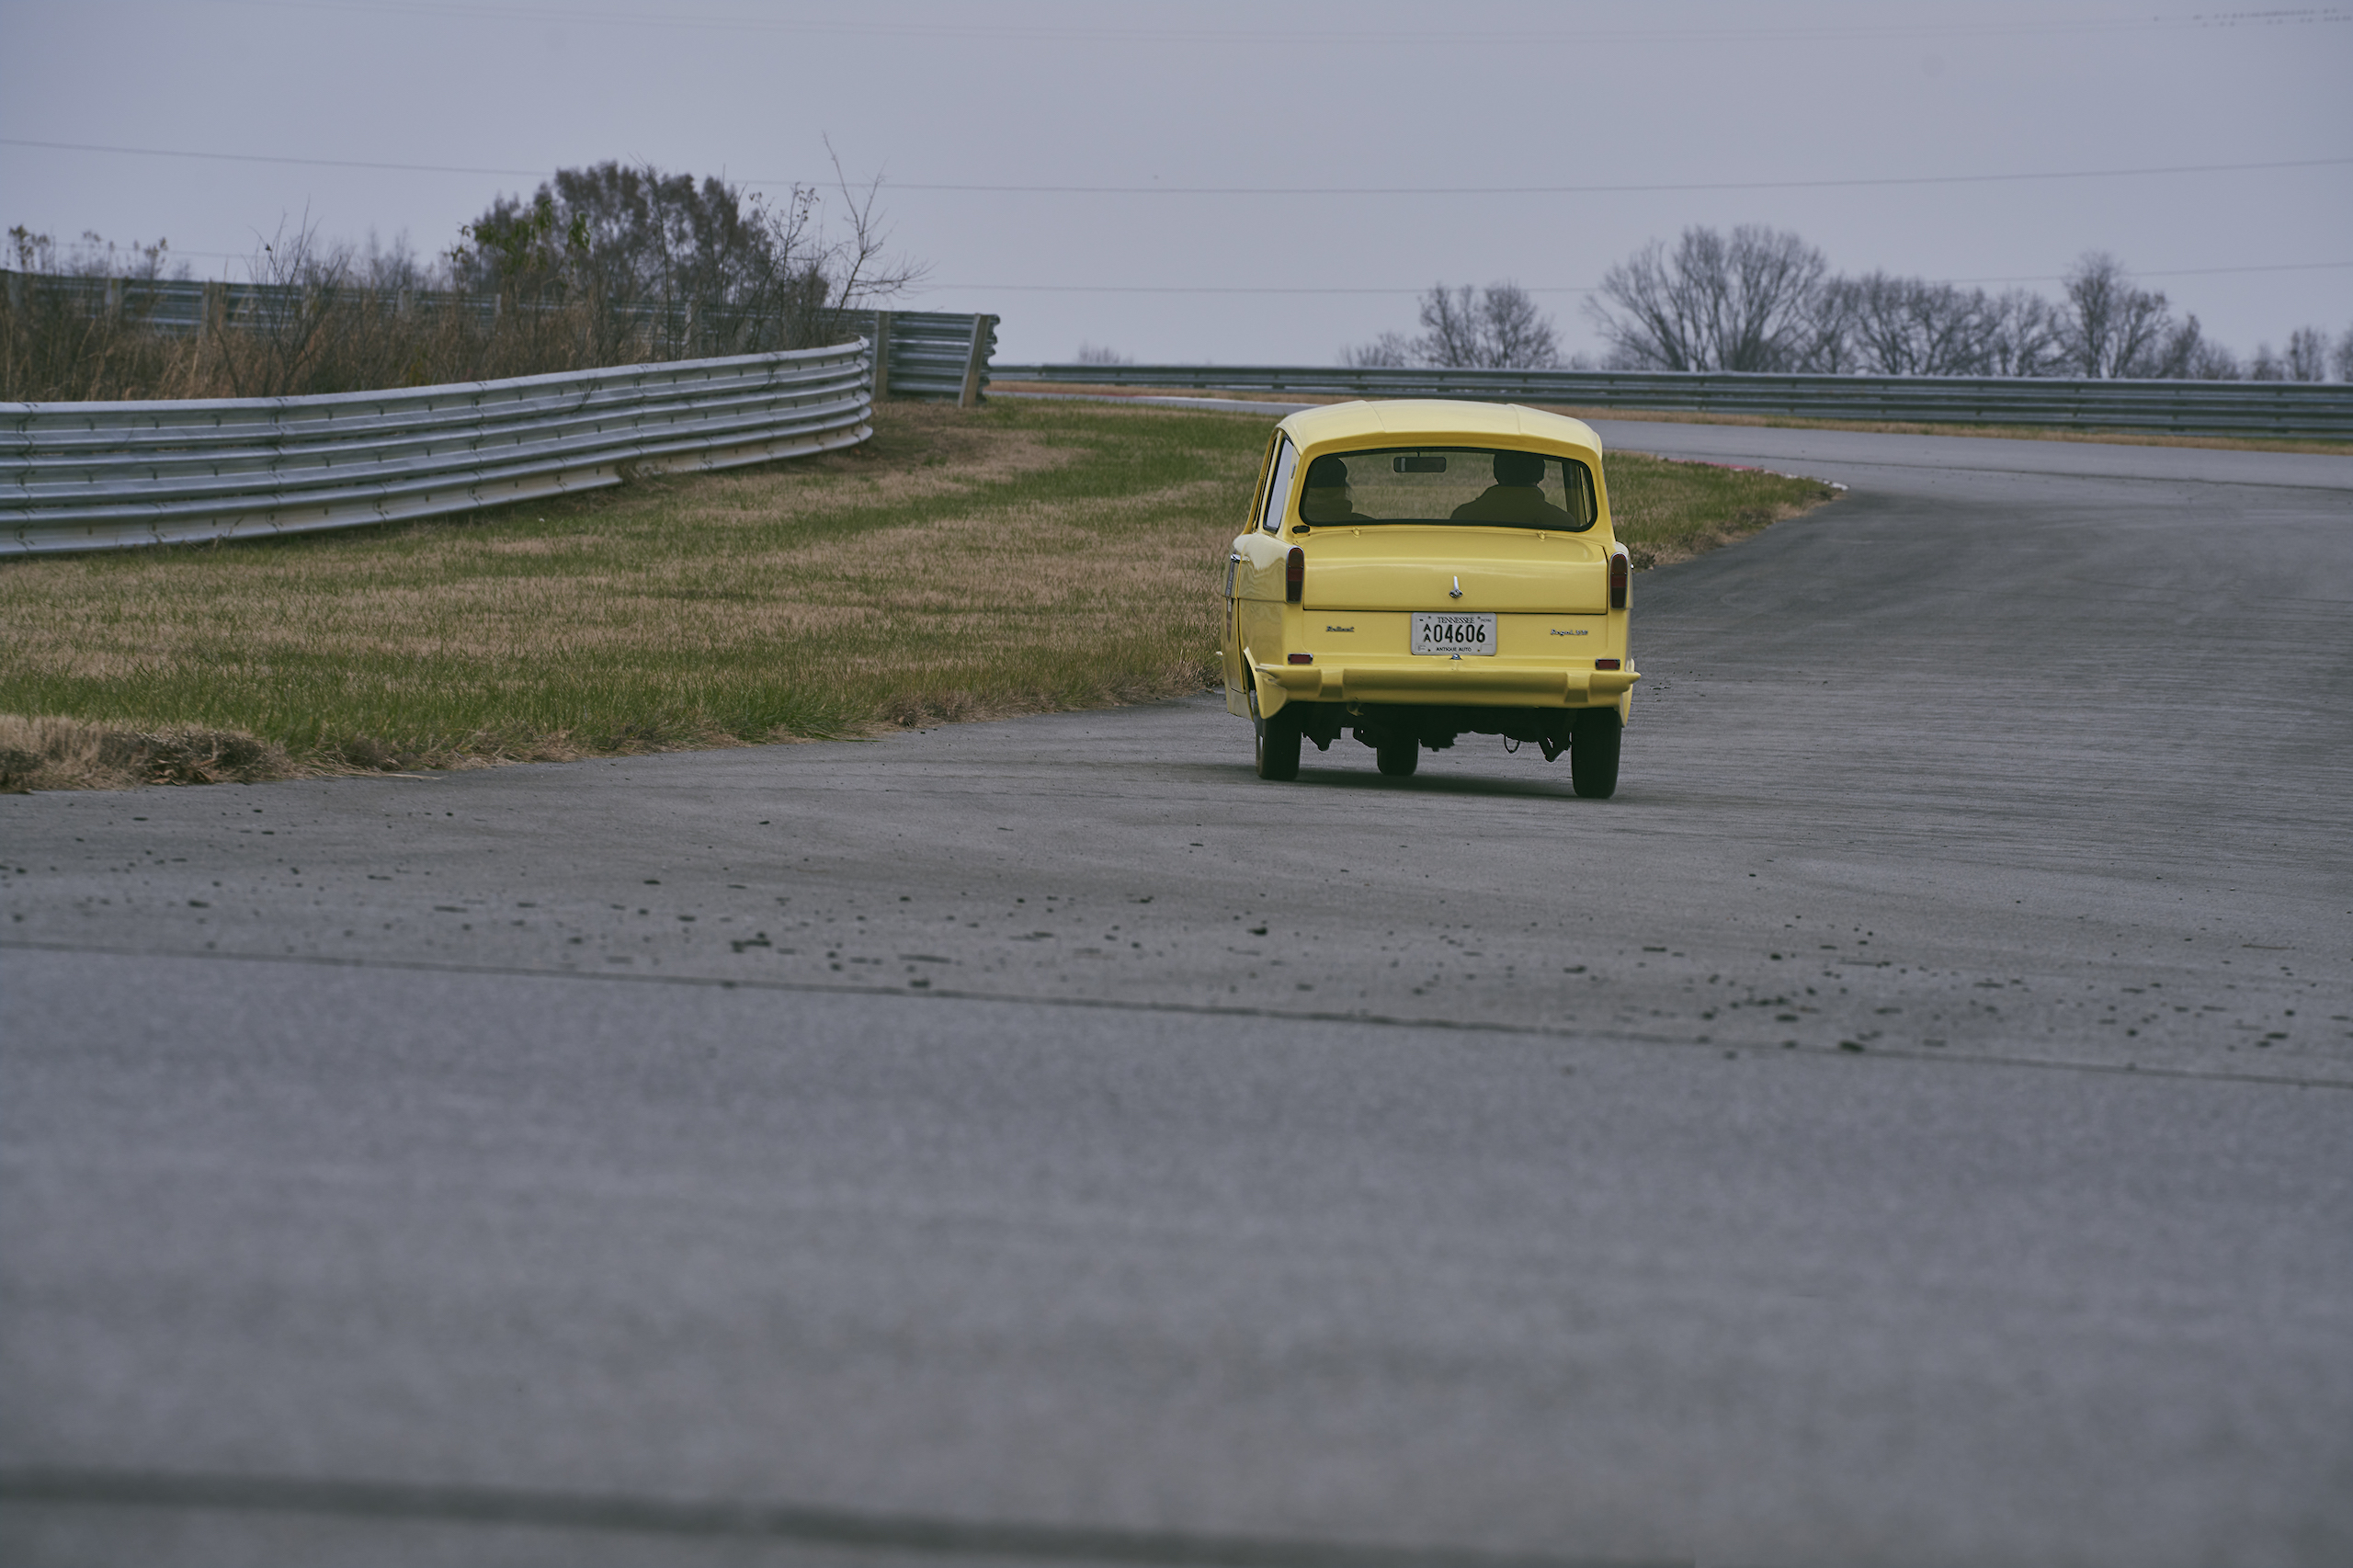 1971 Reliant Regal 330 rear driving action